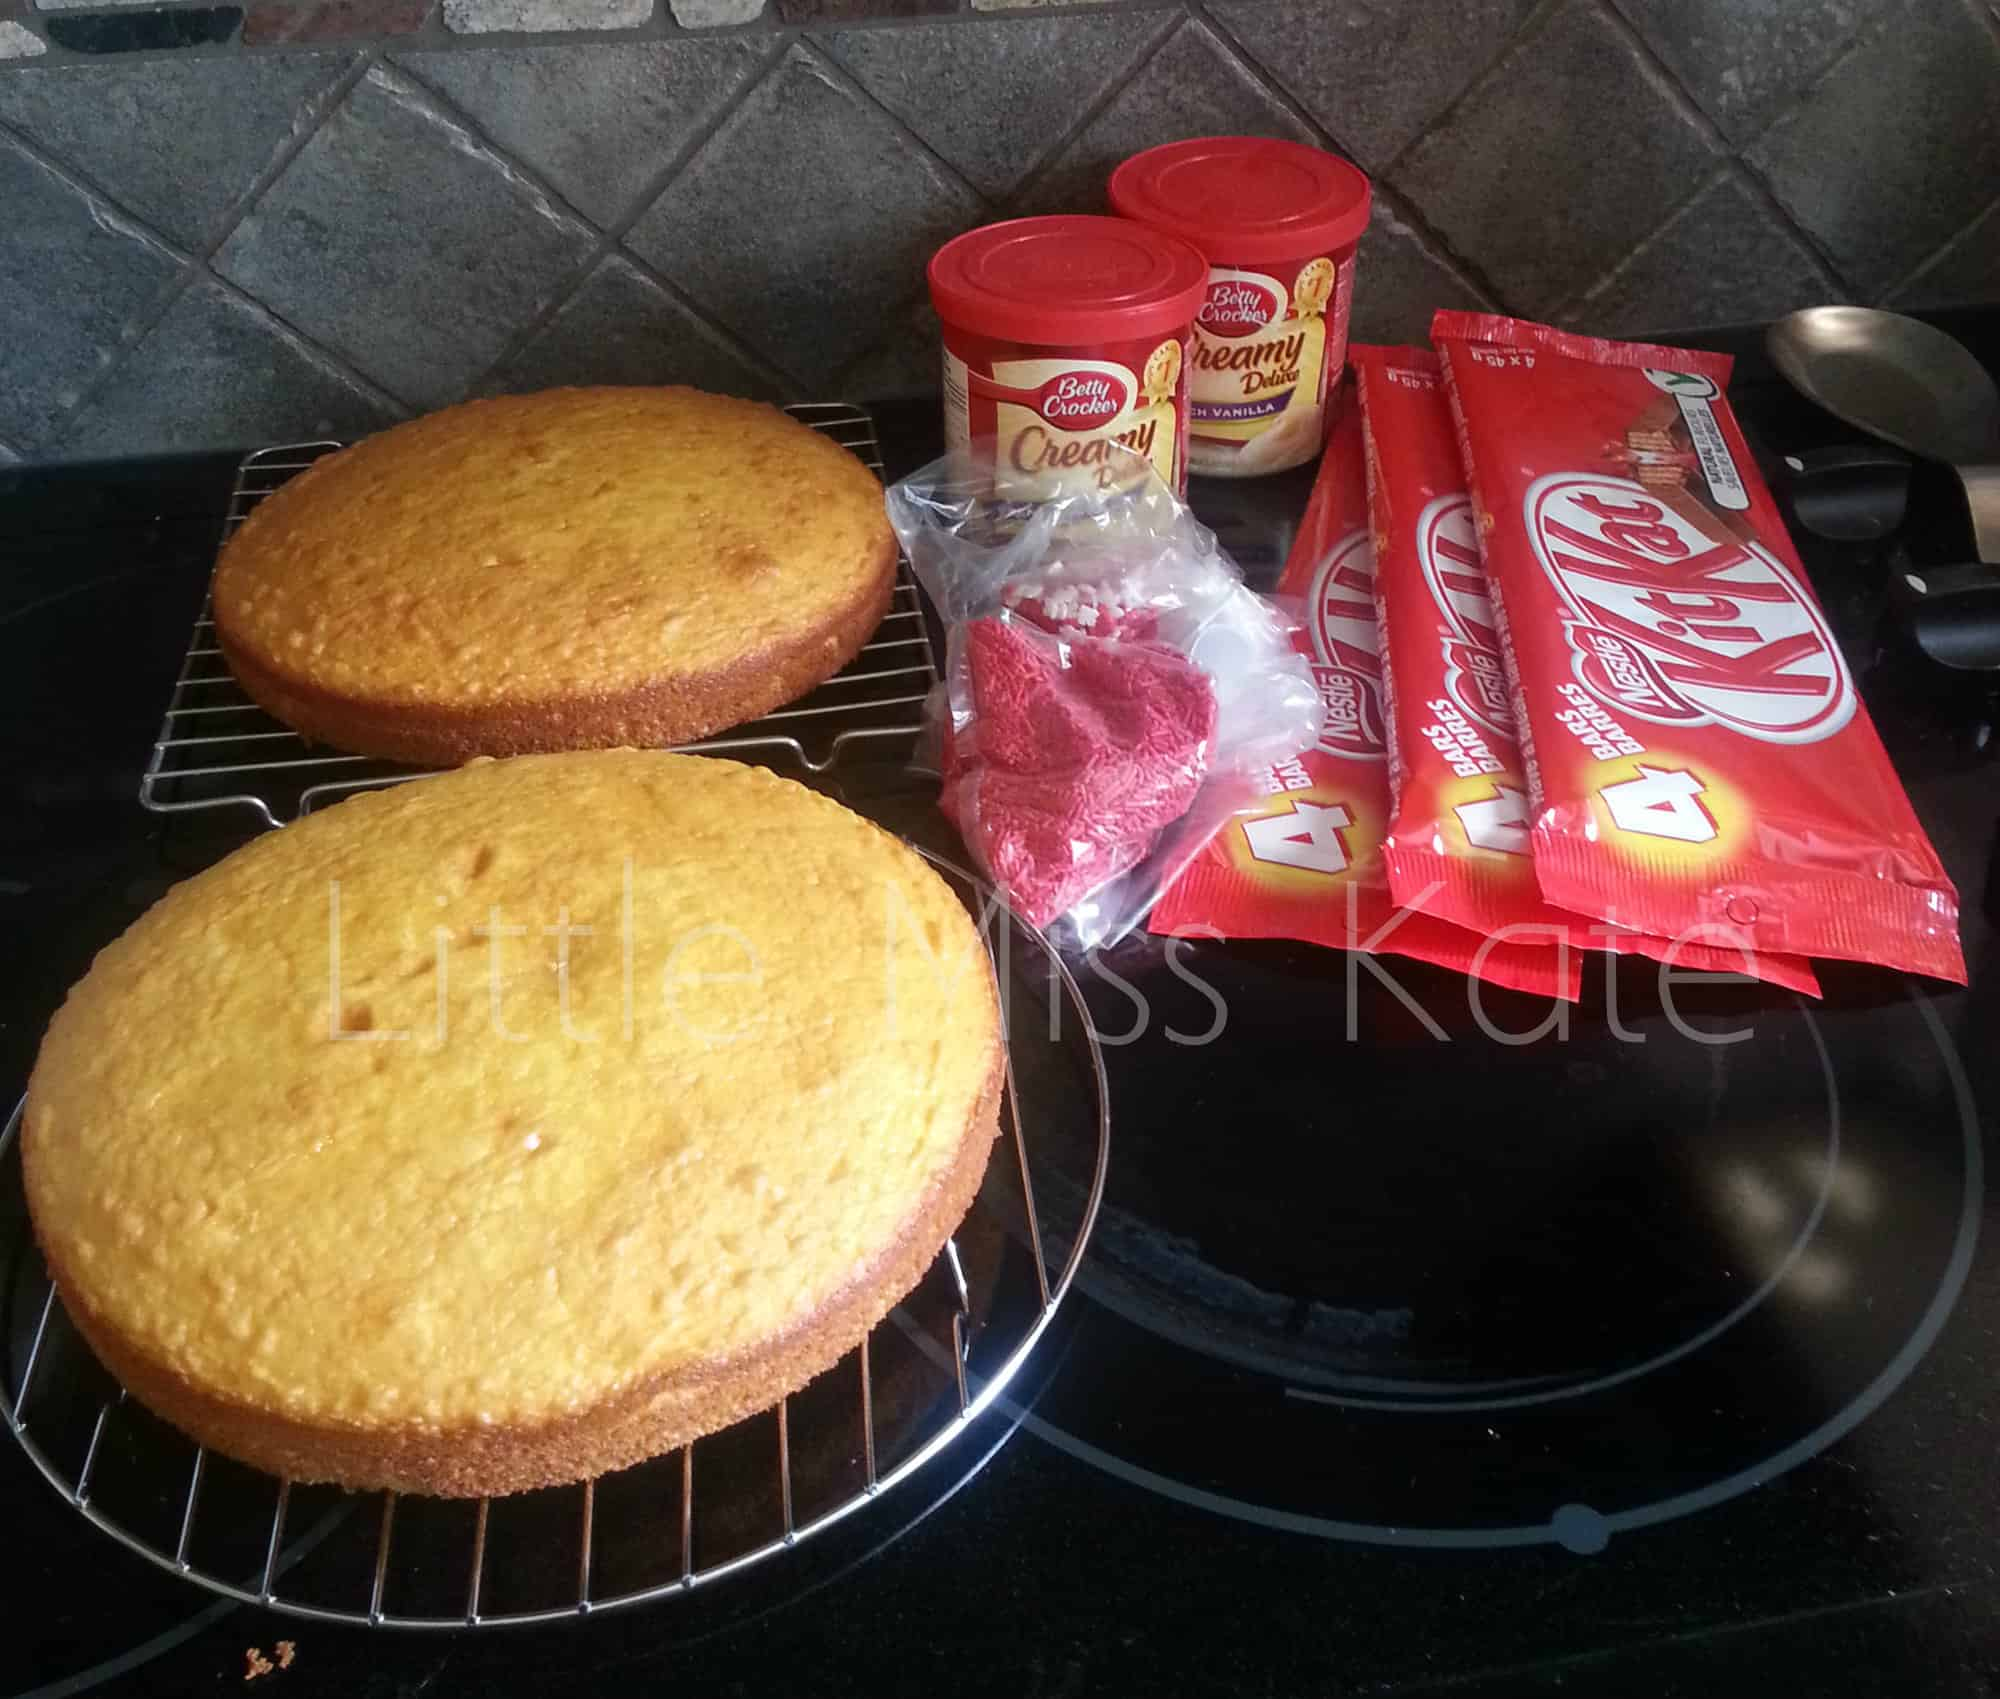 Easy Canada Day Dessert Idea - Kit Kat Canada Day Cake Recipe